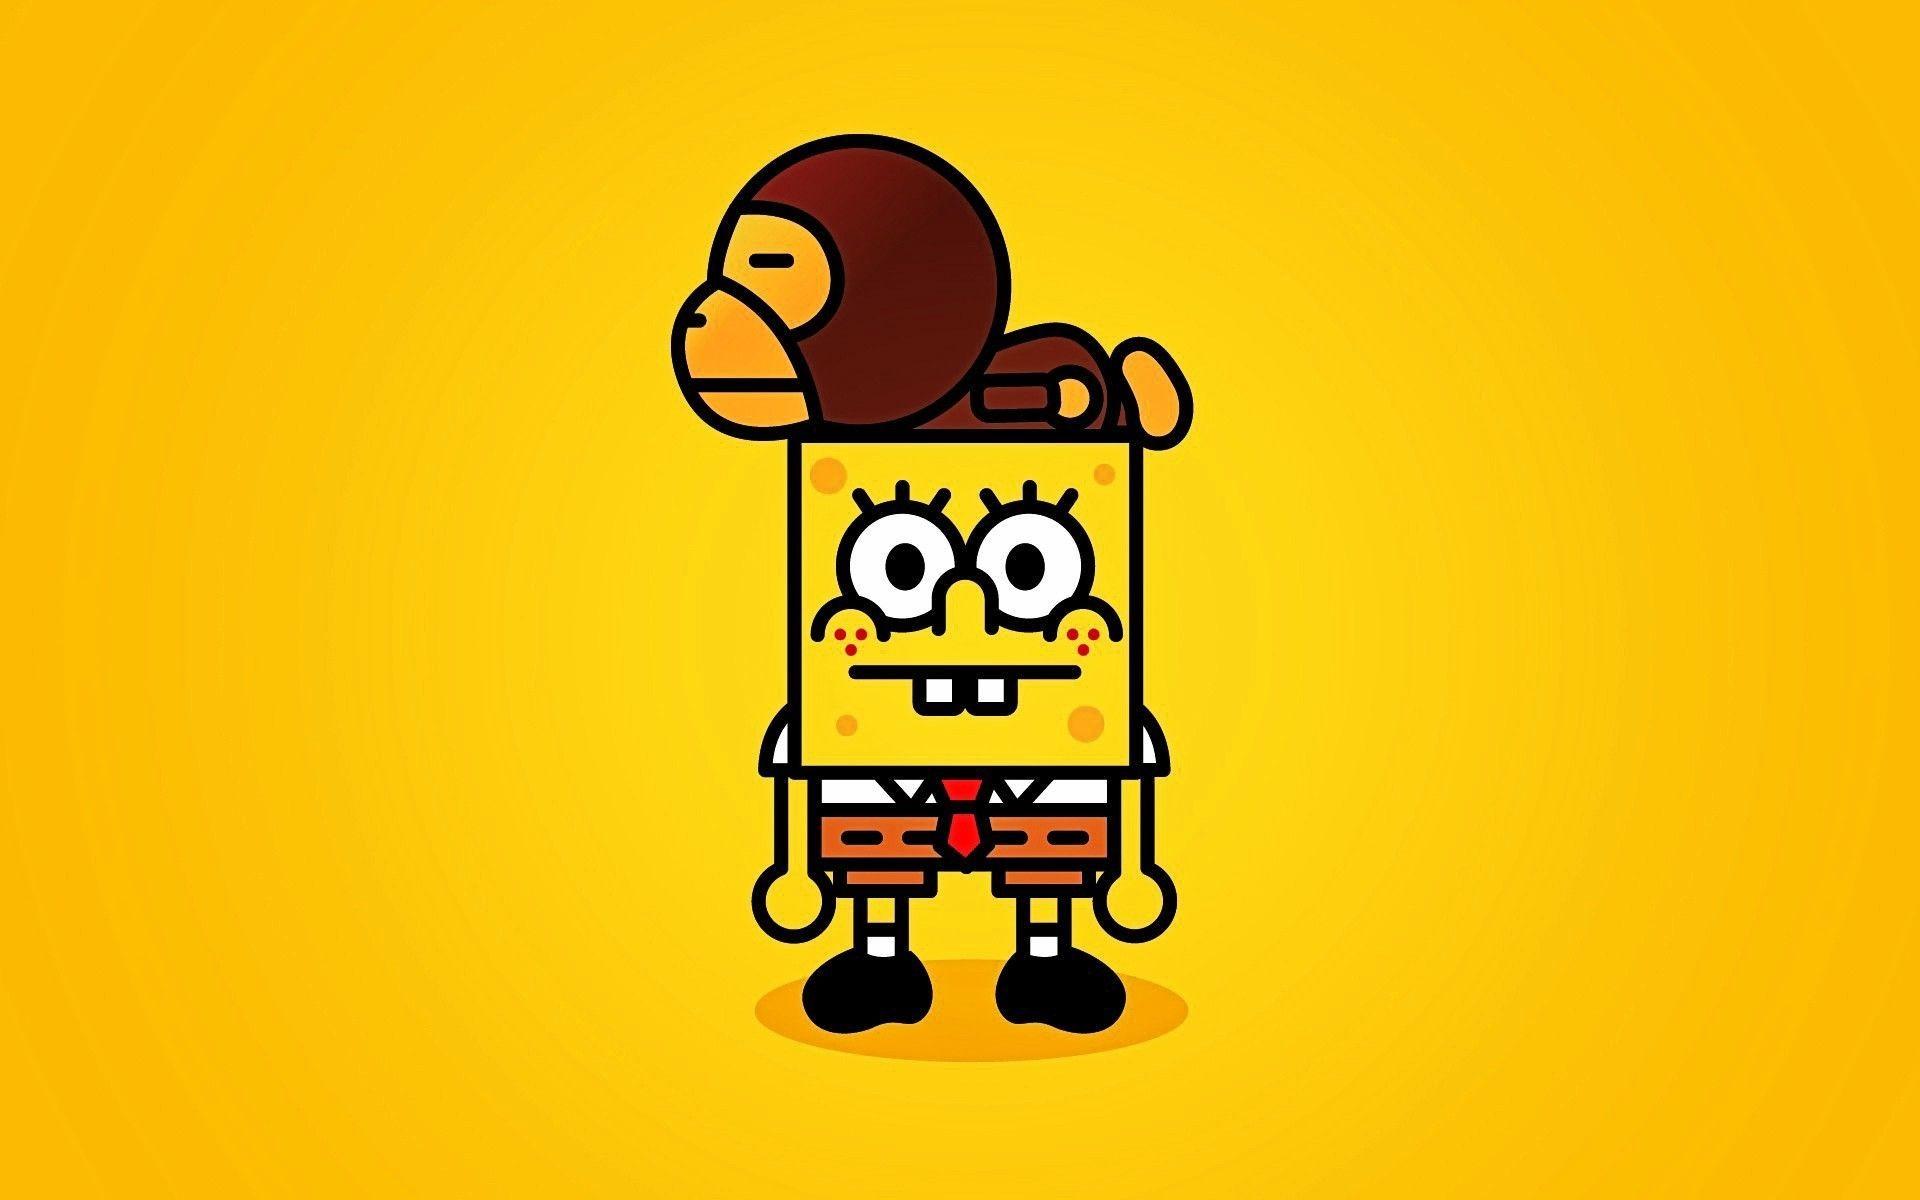 Funny Wallpaper SpongeBob and Monkey